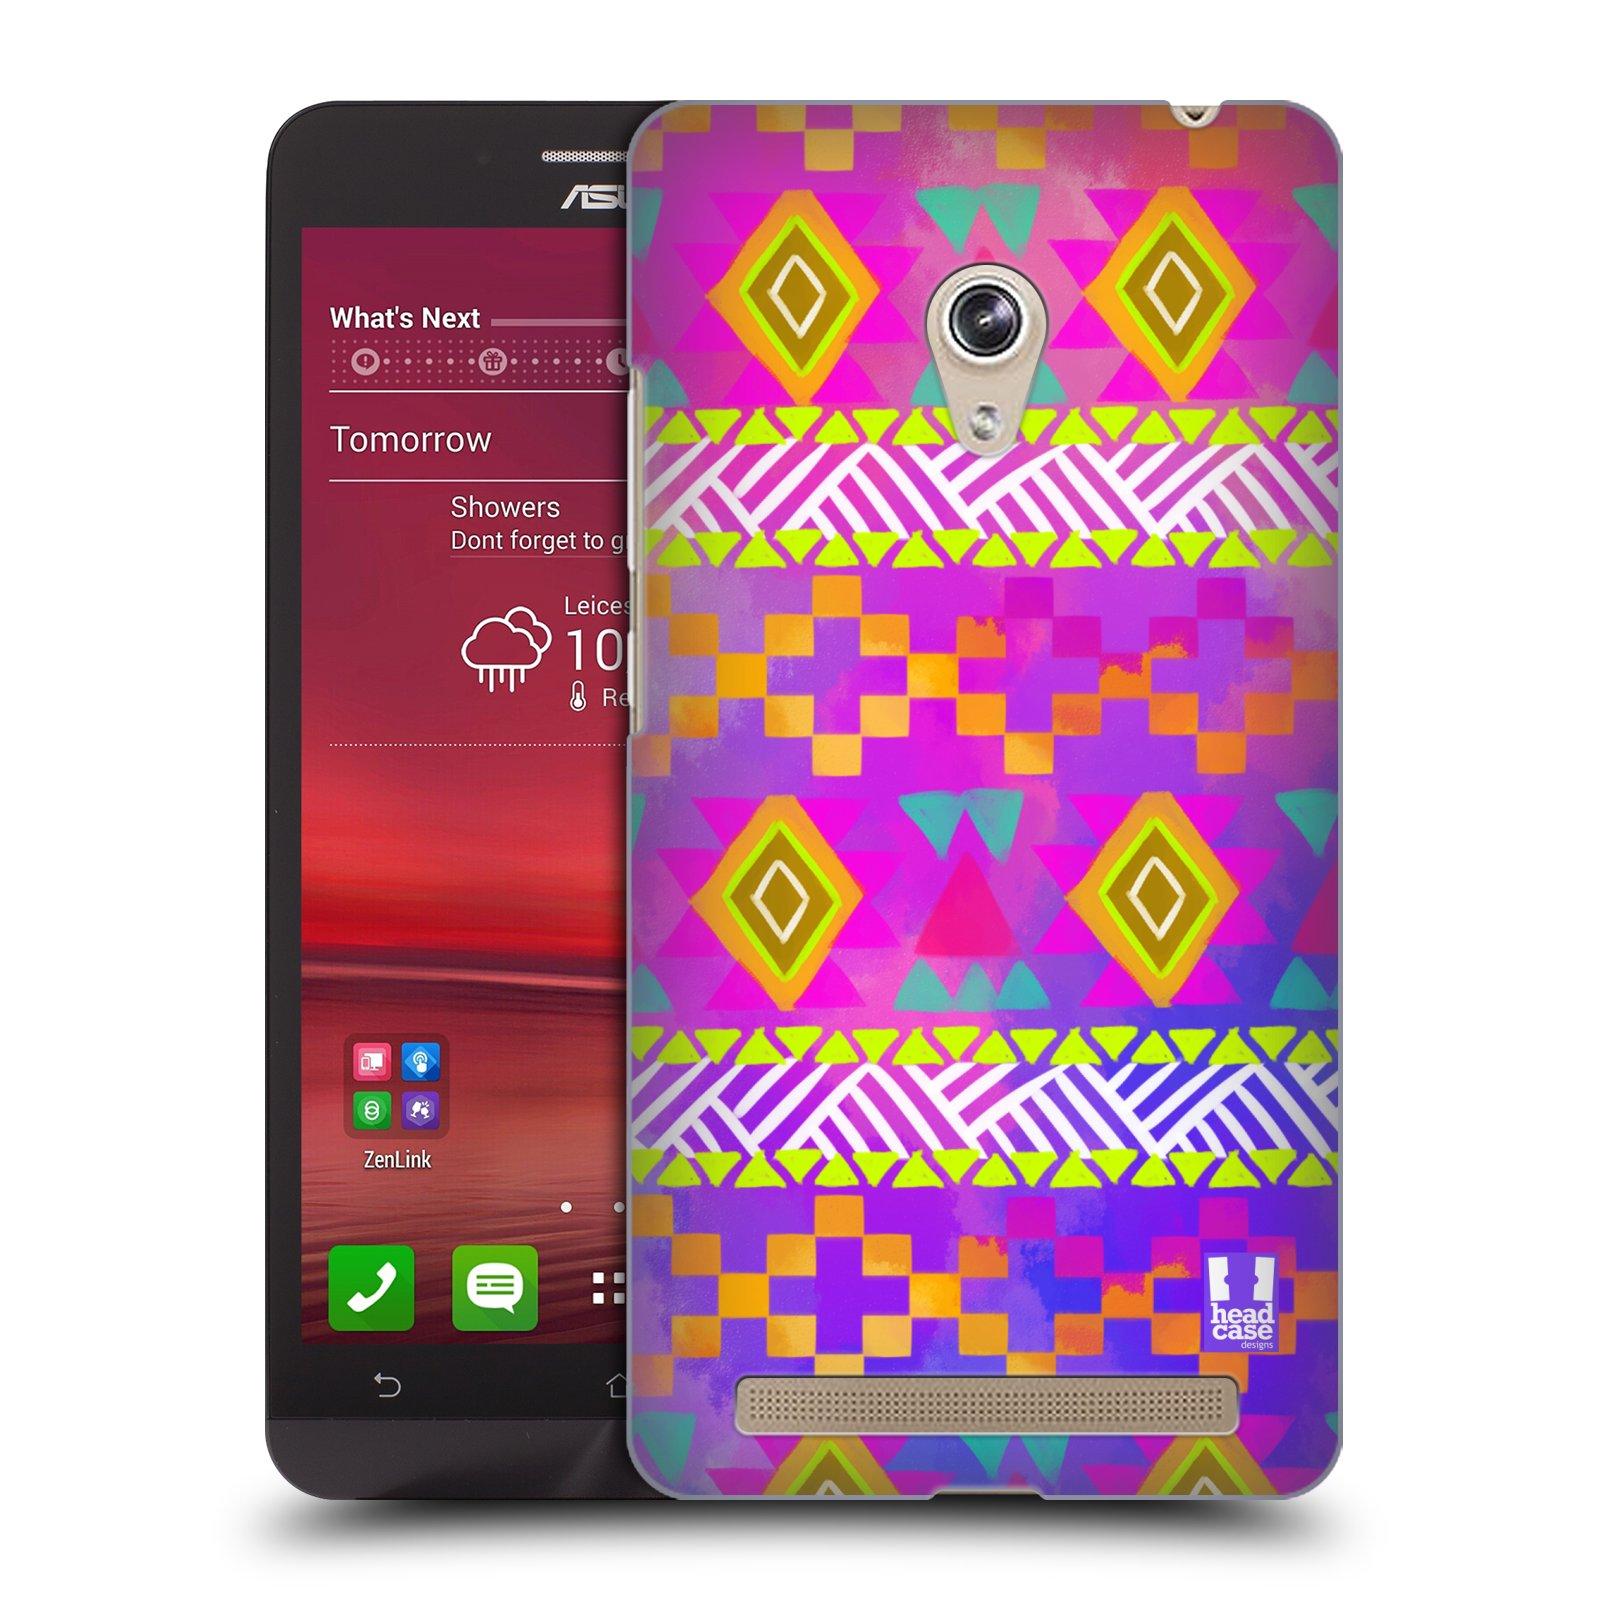 HEAD CASE plastový obal na mobil Asus Zenfone 6 vzor CIK CAK barevné znaky fuchsie